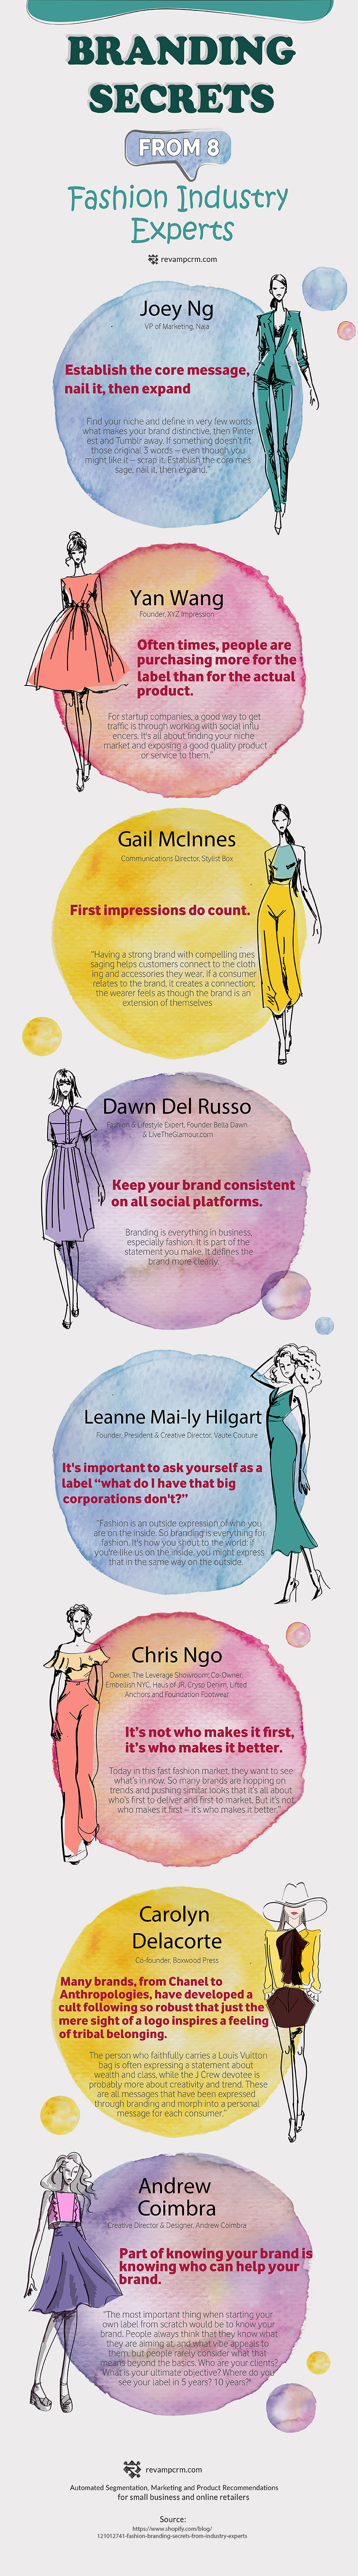 Branding-Secrets3-1